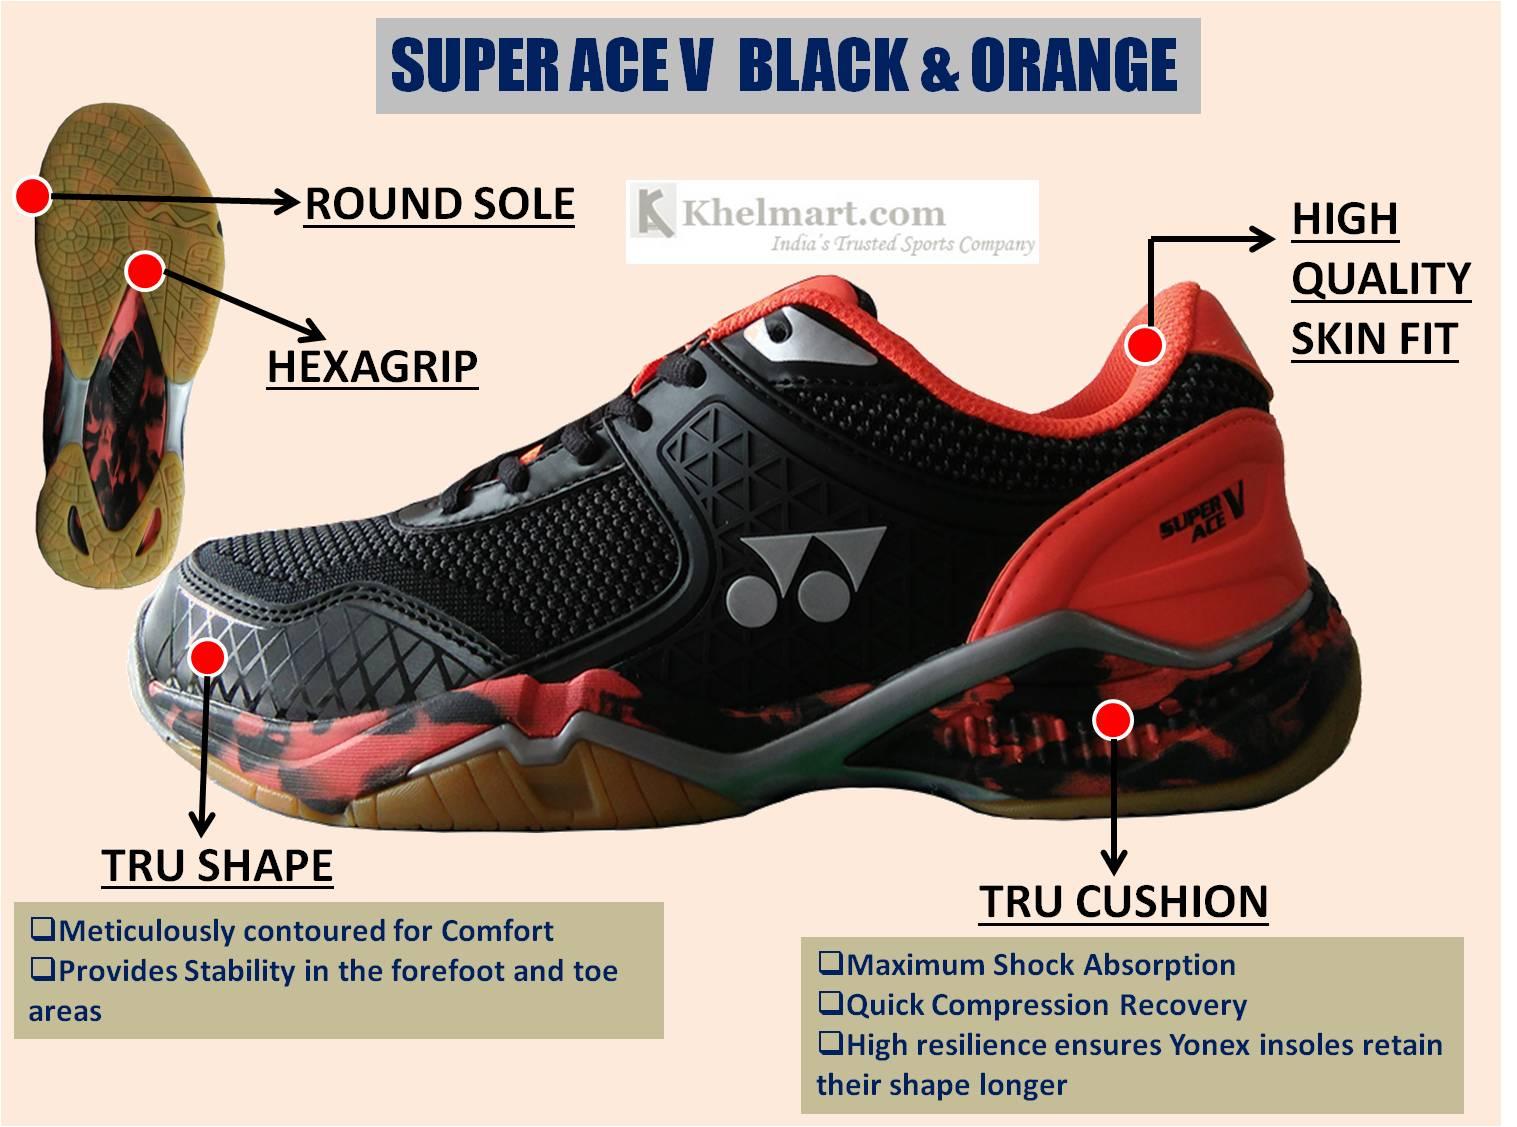 Yonex Super ACE V Badminton Shoes Black and Orange_4